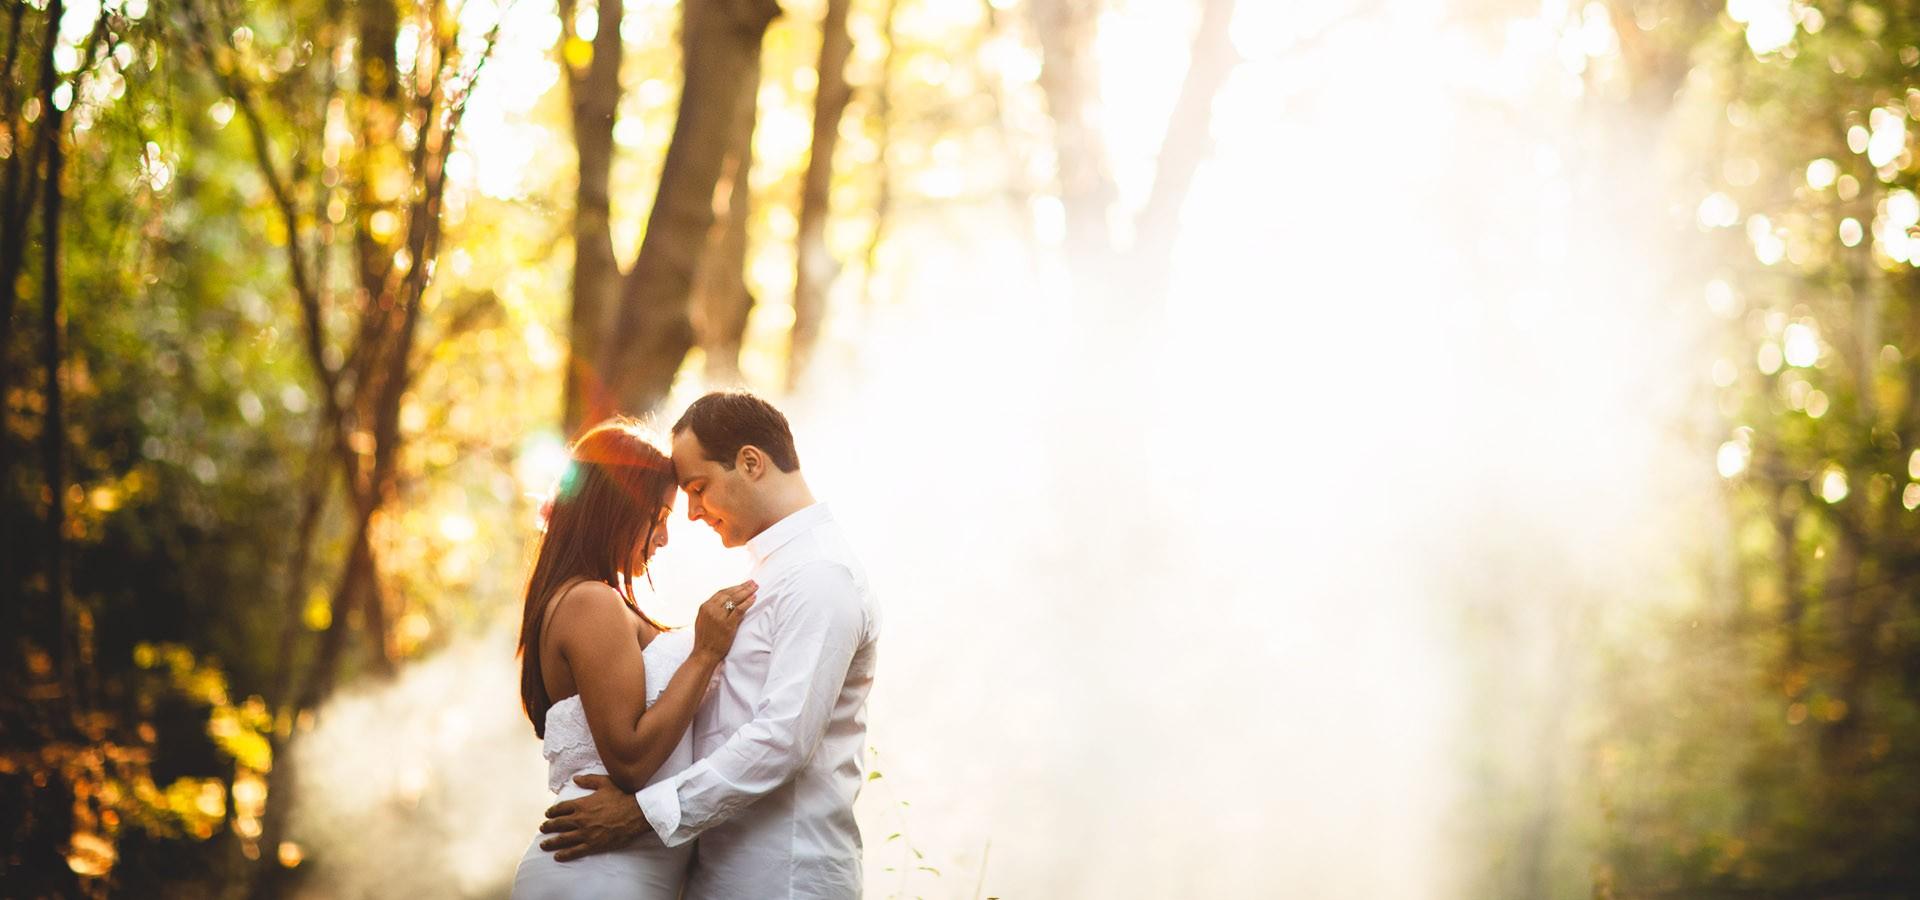 Wedding Photographer By Farelight Weddings Call Us Now ...